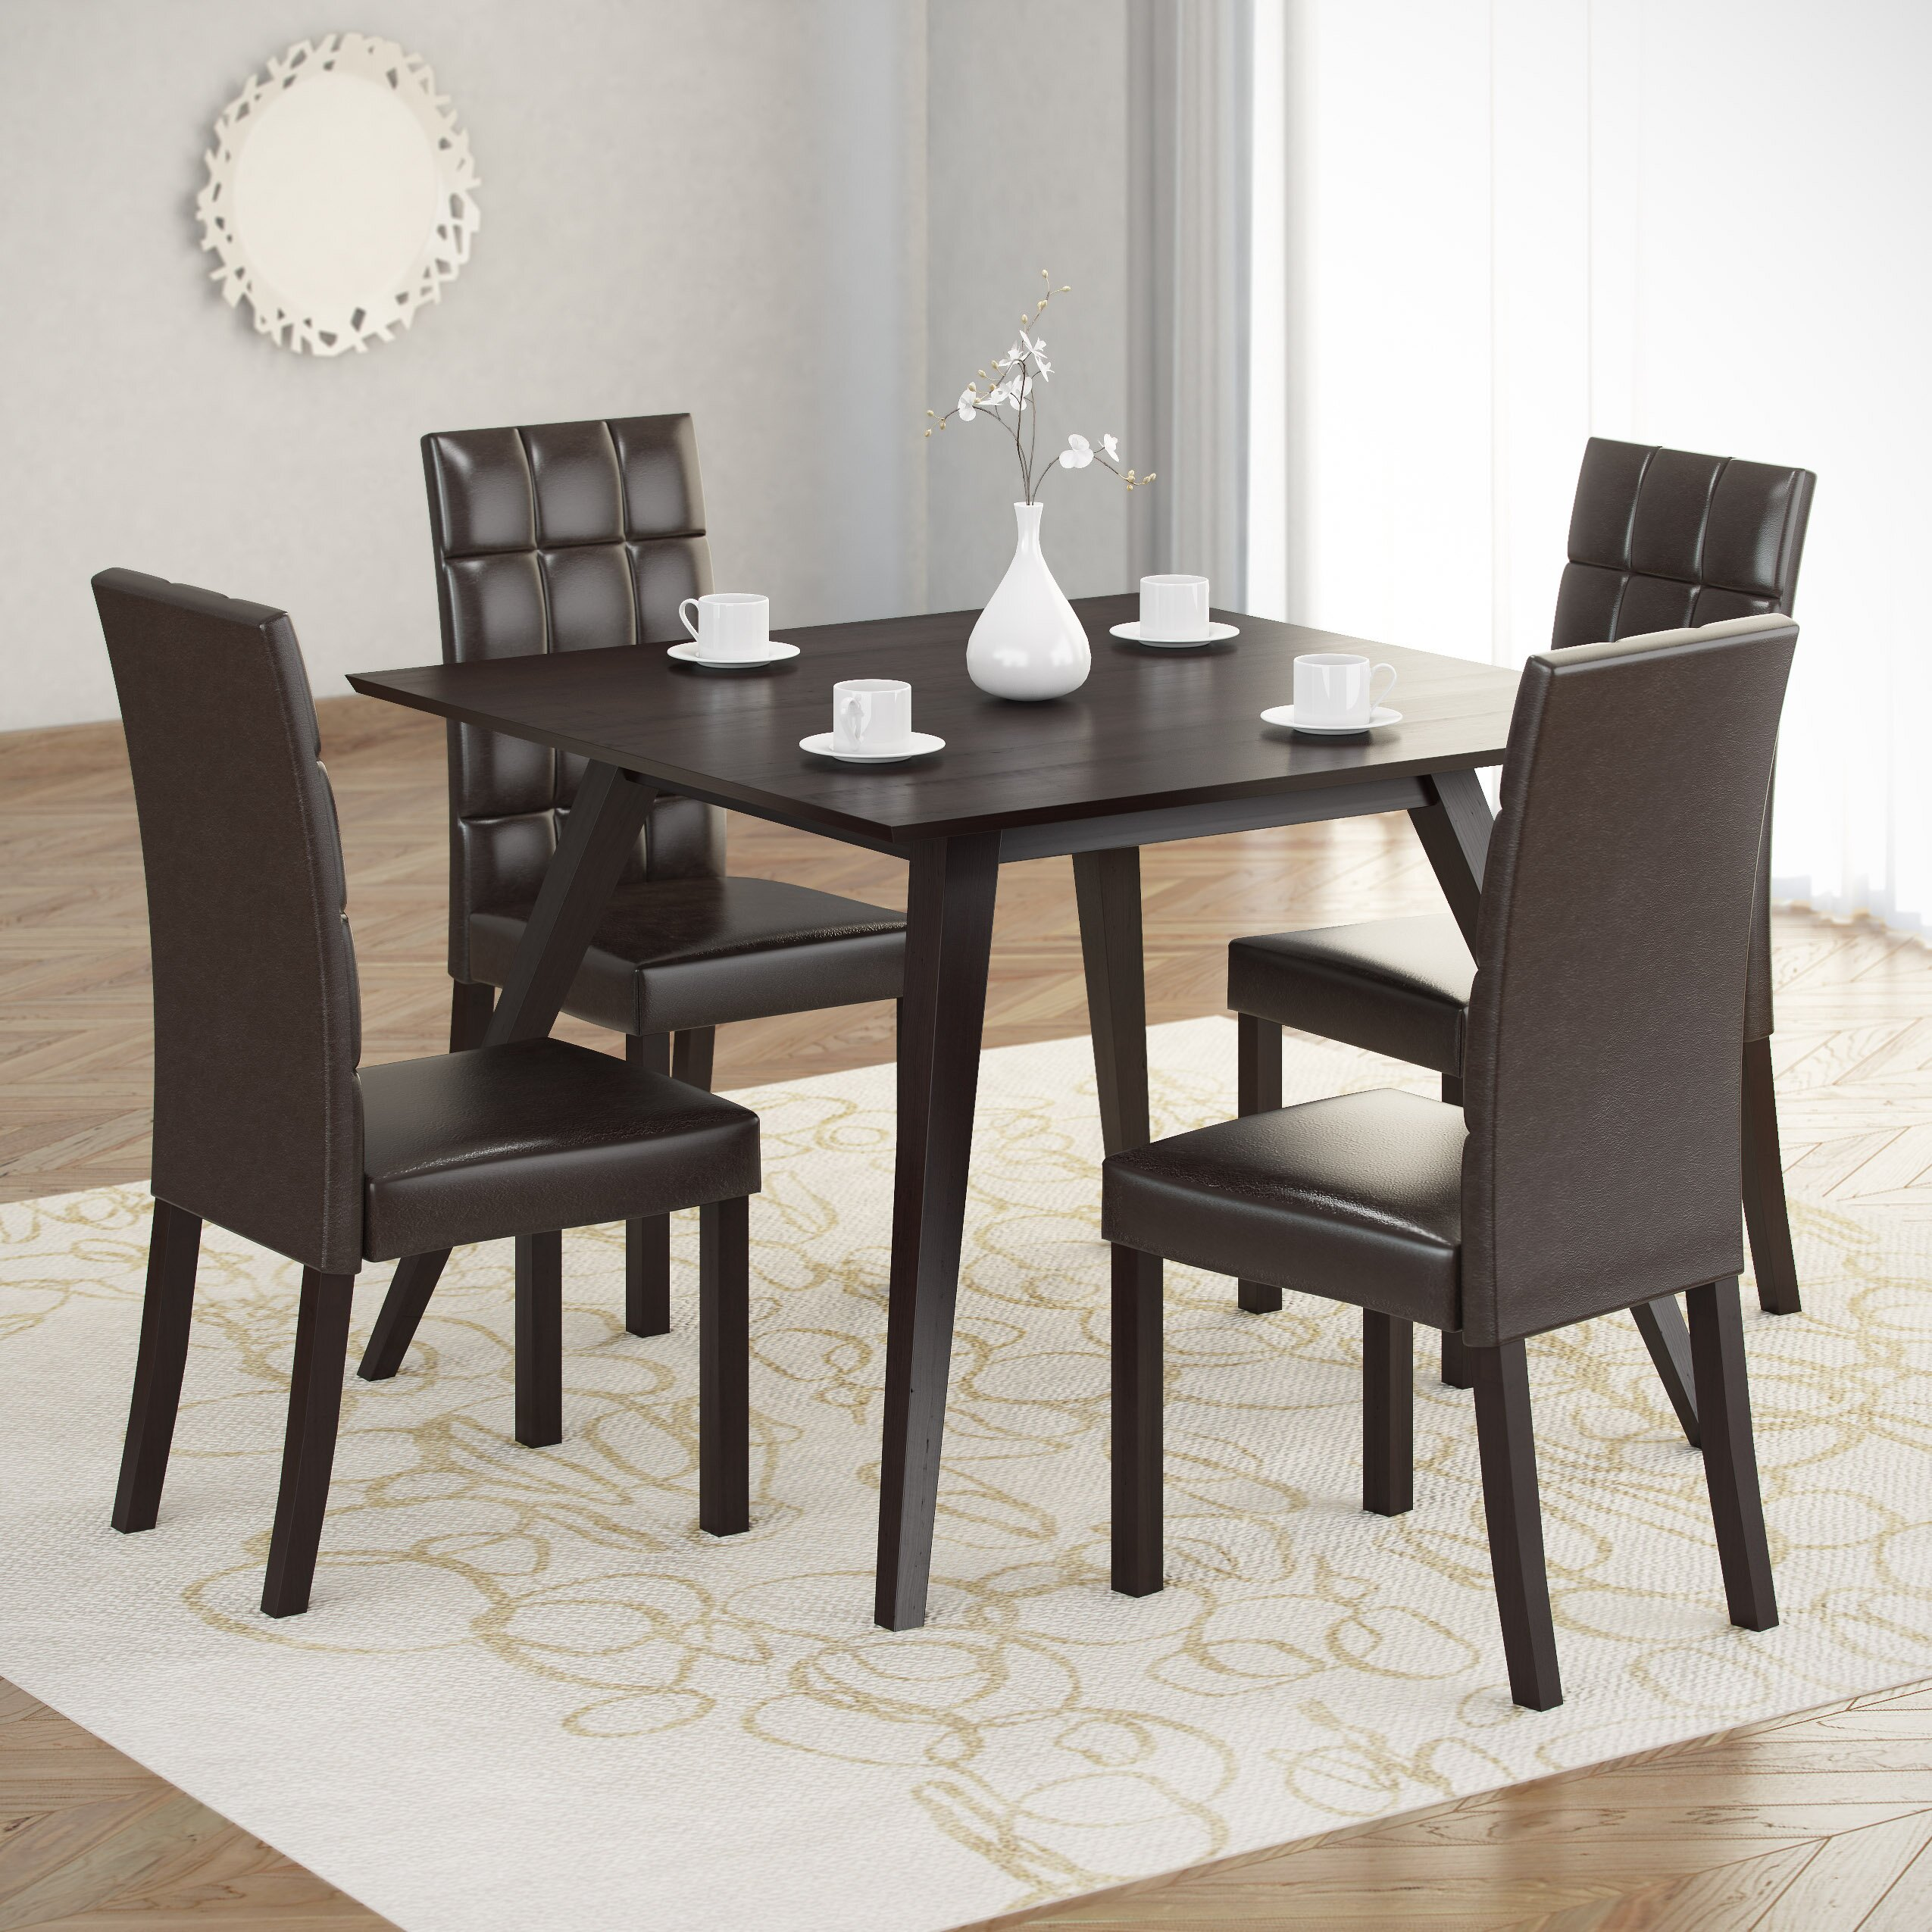 dcor design furniture dcor design furniture dcor design dcor designfurniture dcor design lahti lounge. popular  list dcor design furniture